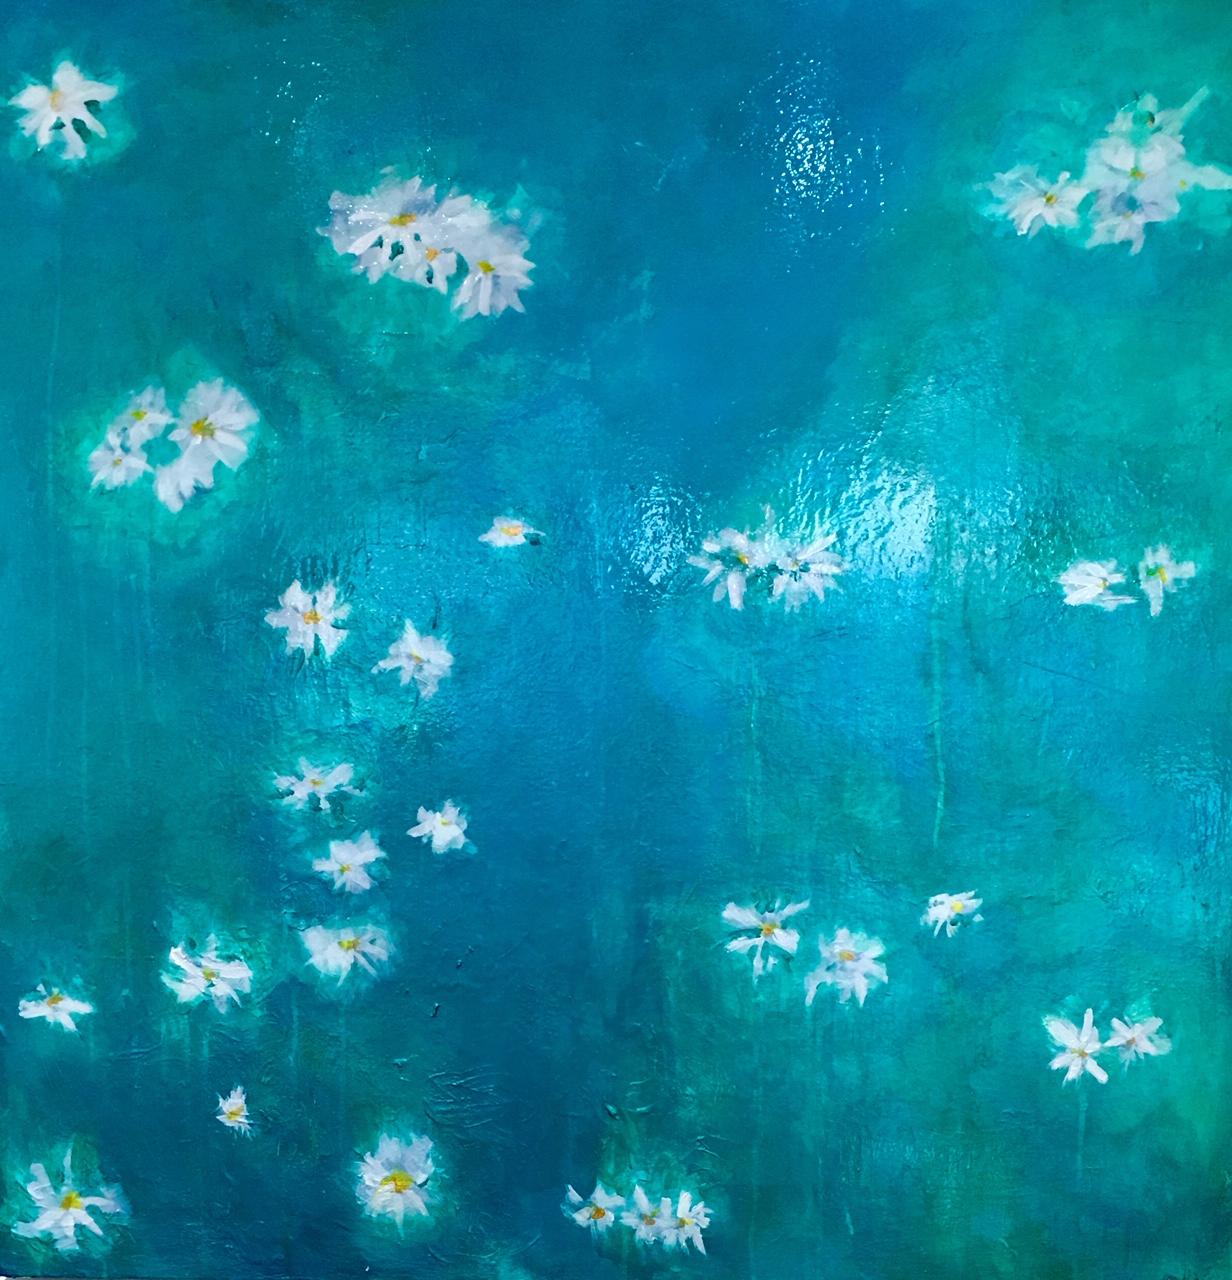 Daisylilies.jpg